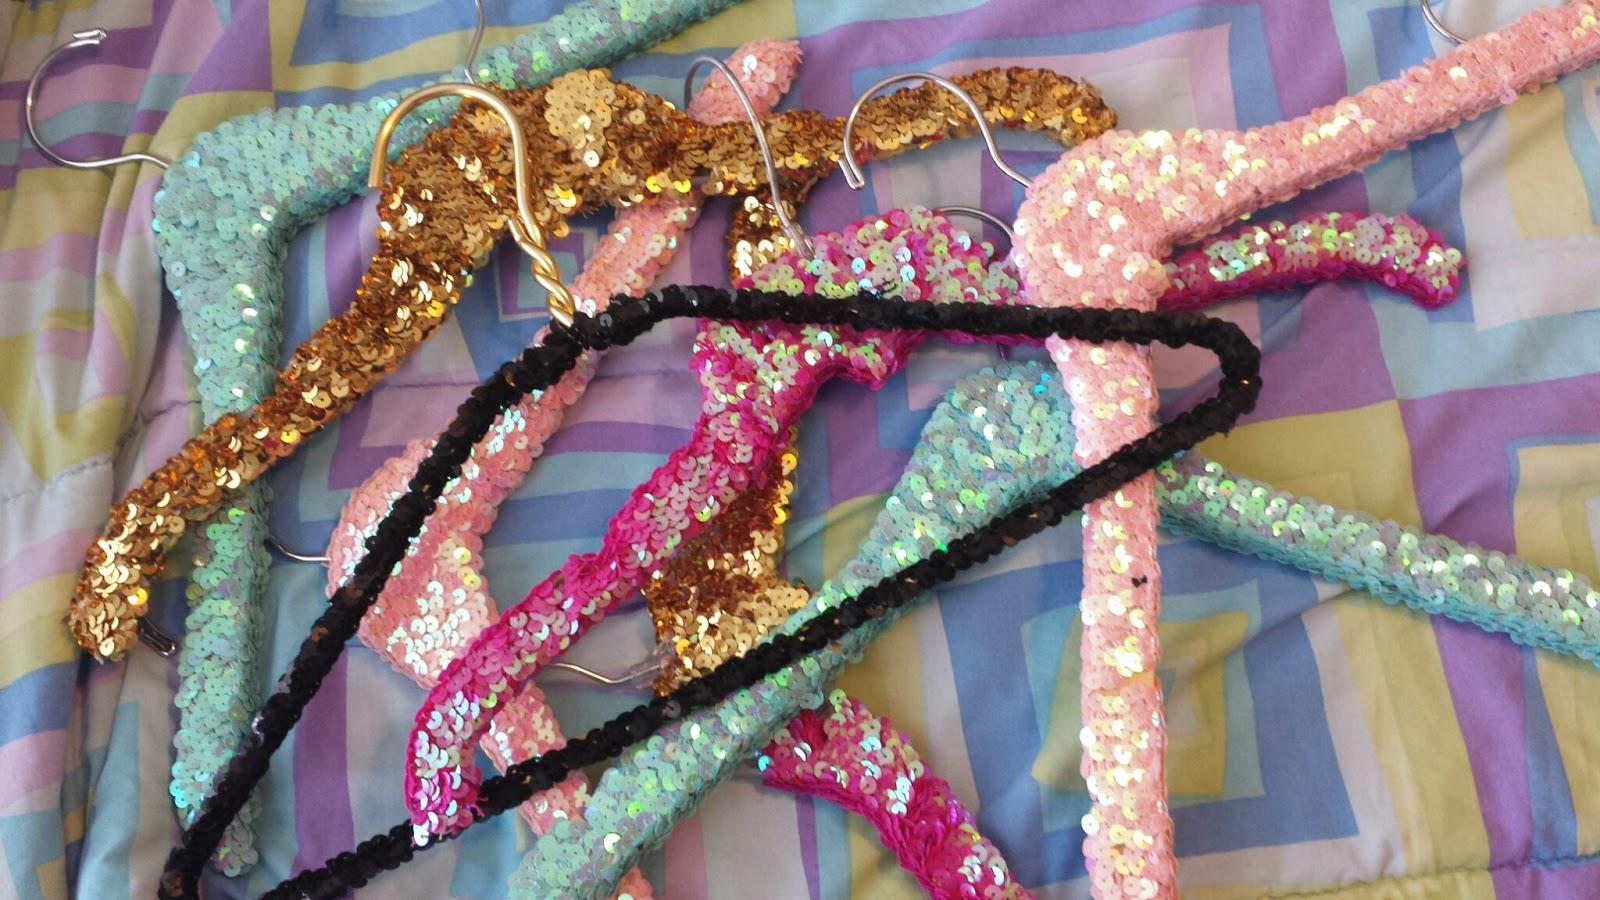 pearls and pastries, etsy, sequin hangers, diy, sale, hangers, cute room ideas, decor, sequins, p&p shop, the original sequin hanger